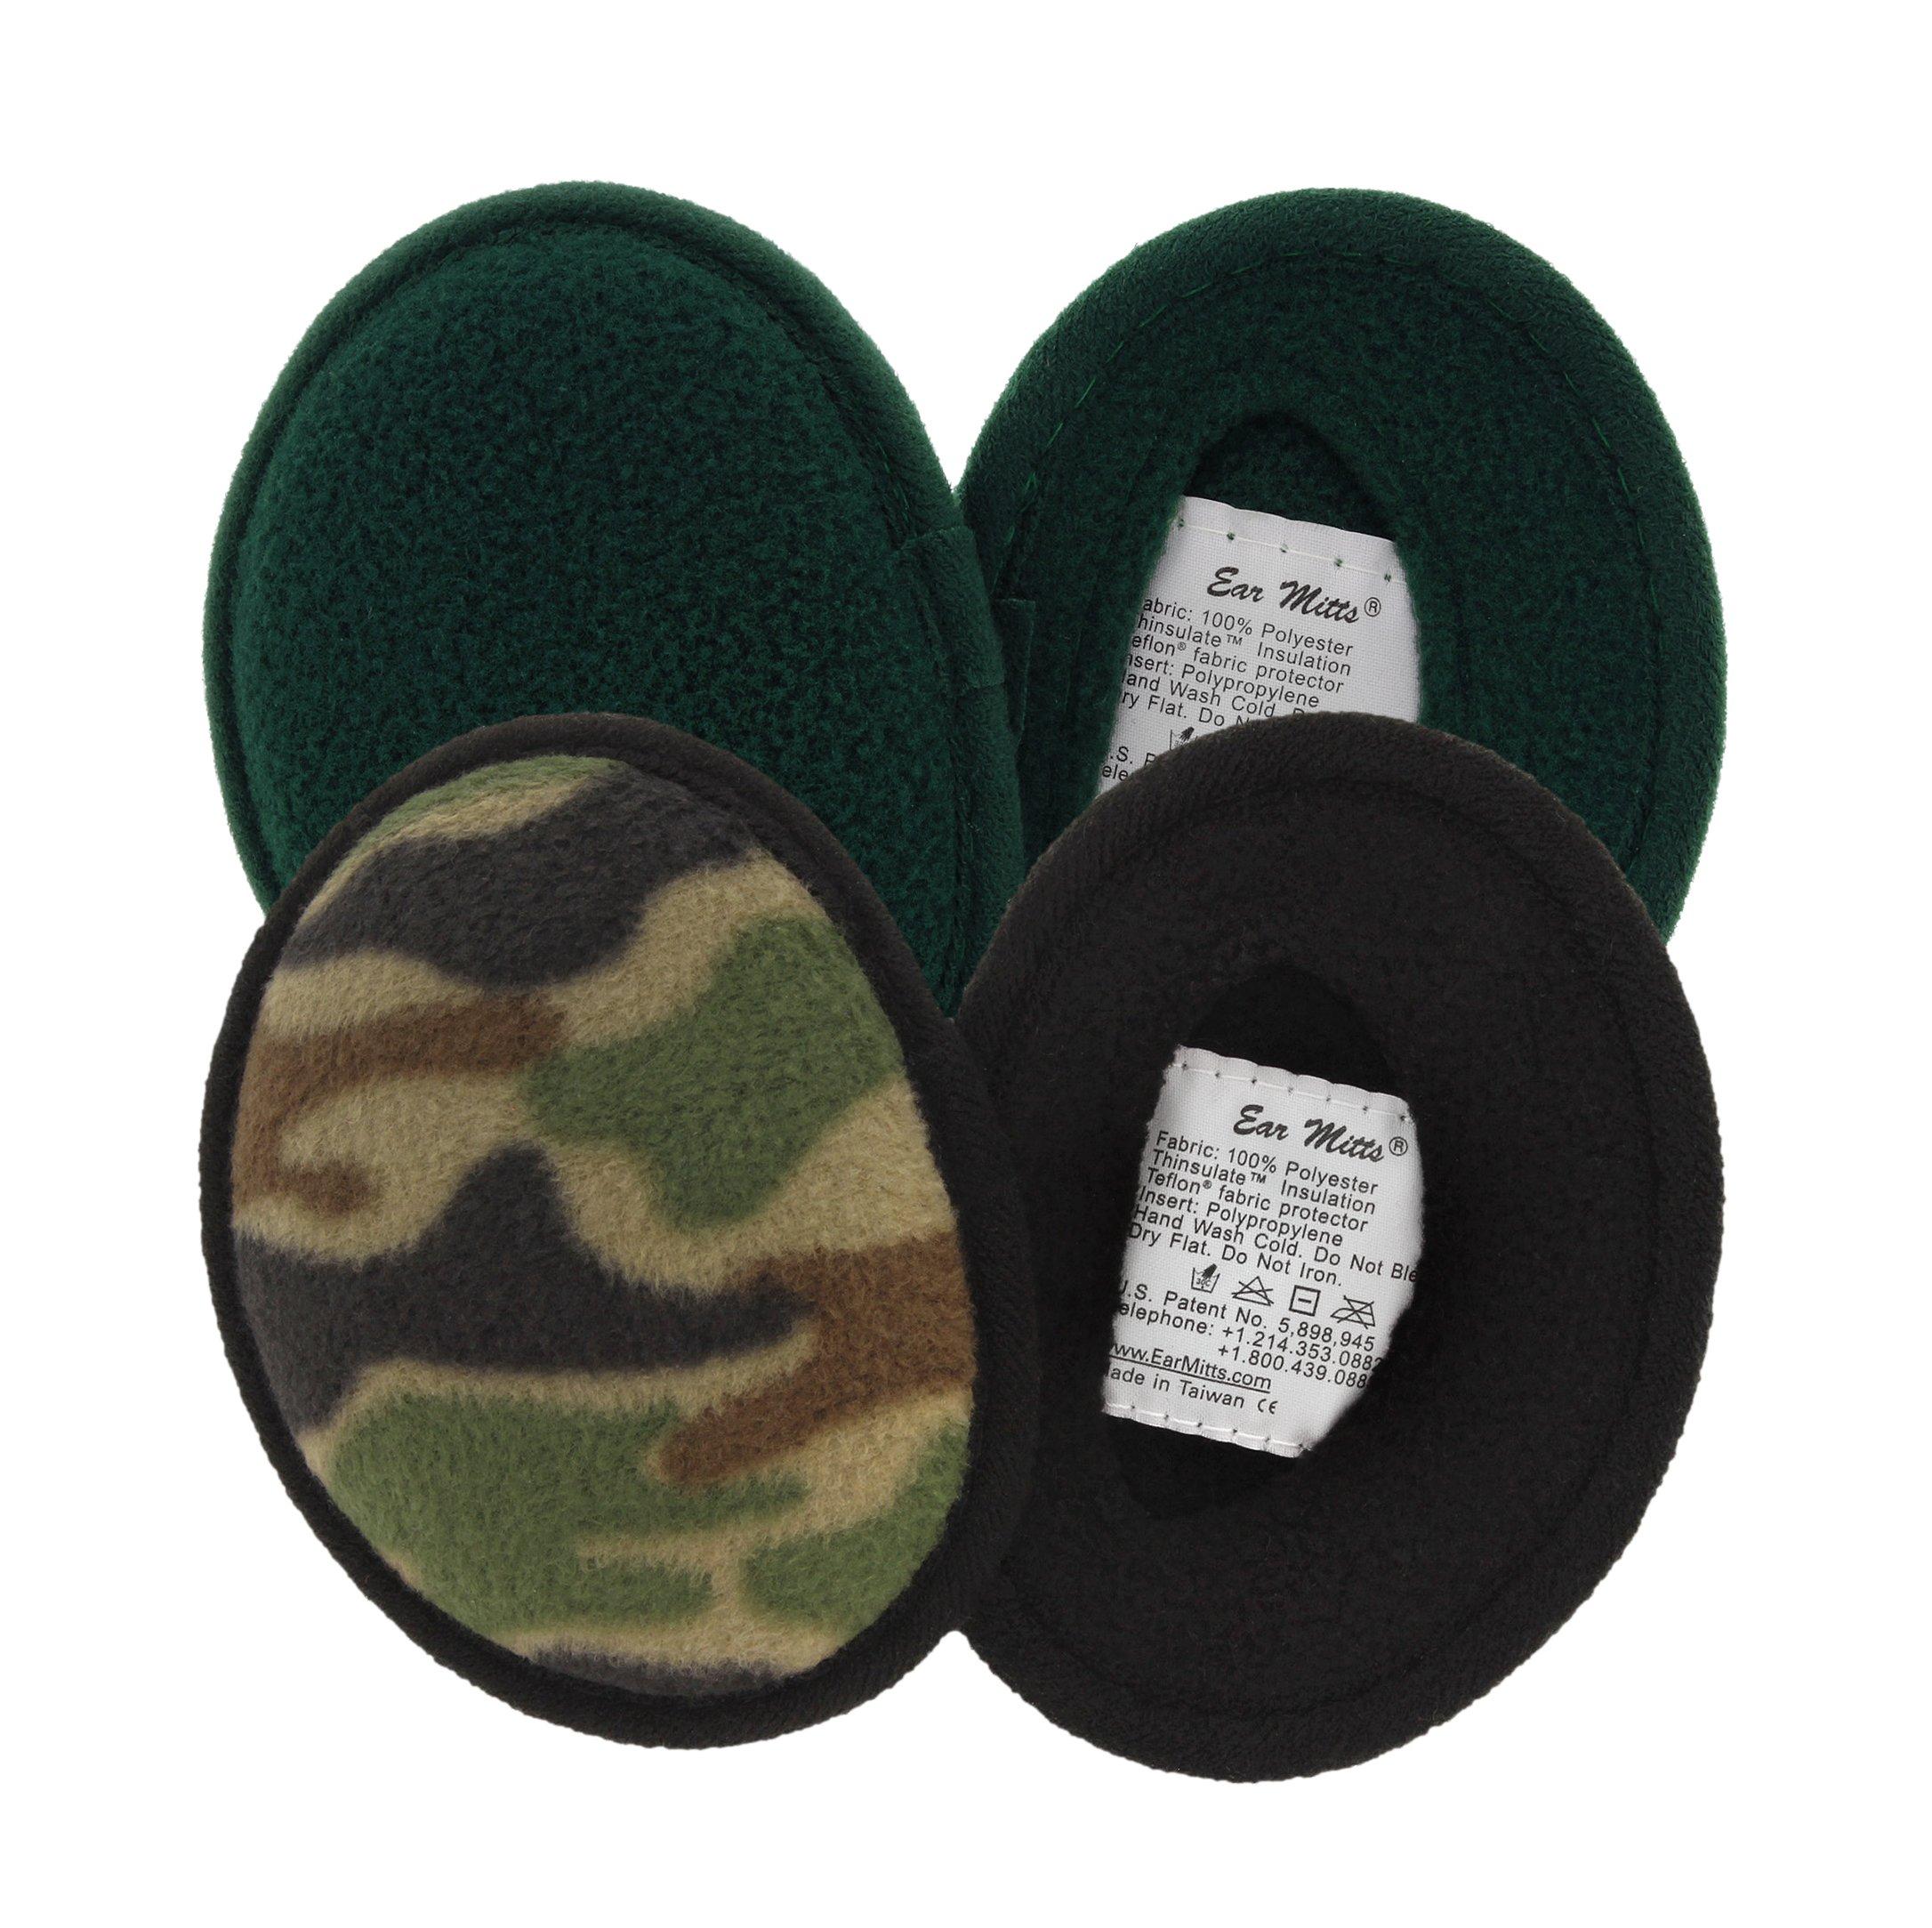 2 Pack Ear Mitts Fleece Bandless Ear Muffs For Men, Camo & Forest Green, Small